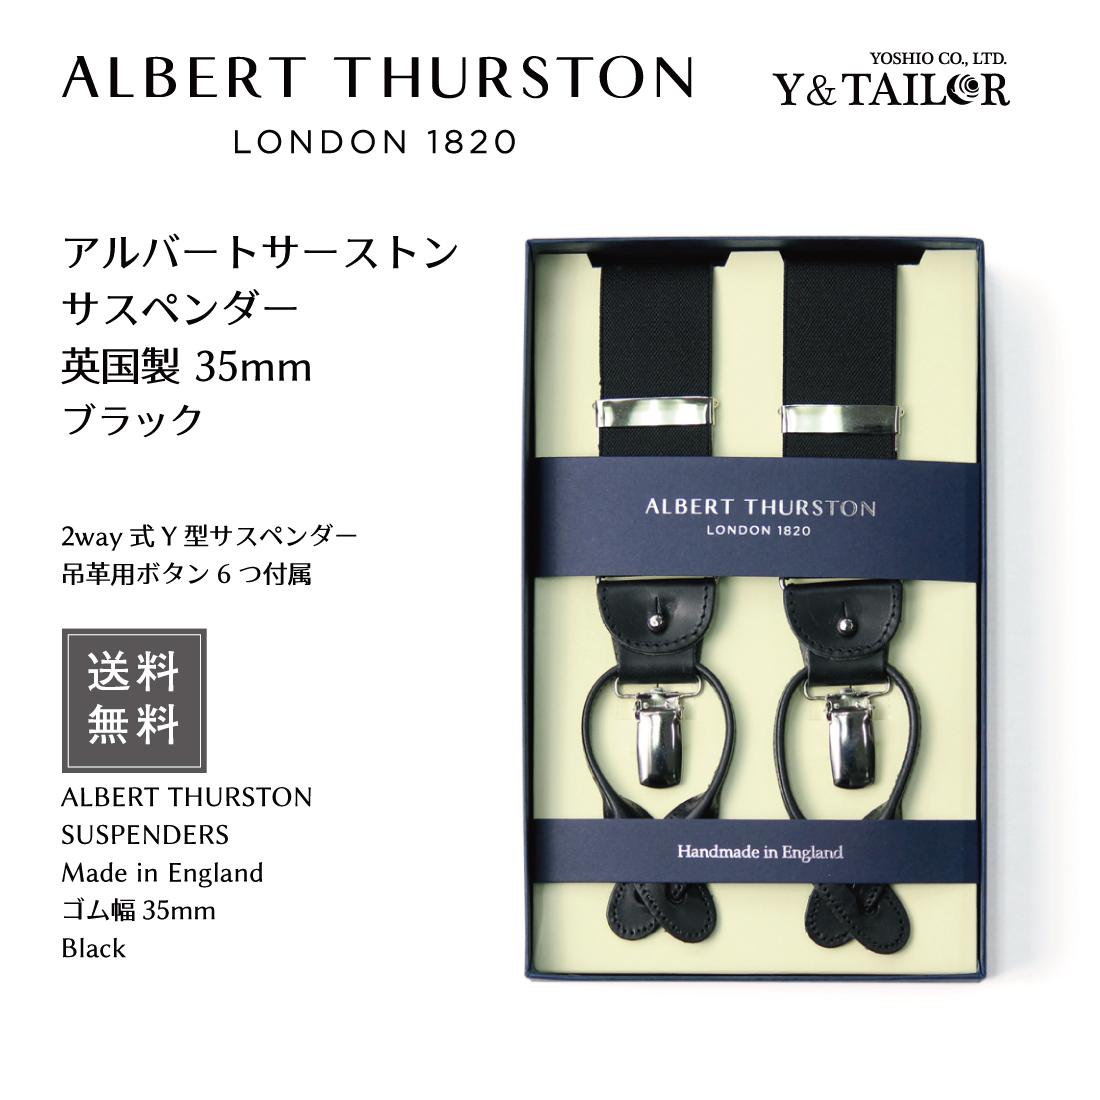 ALBERT THURSTON サスペンダー 英国製 35mm ブラック